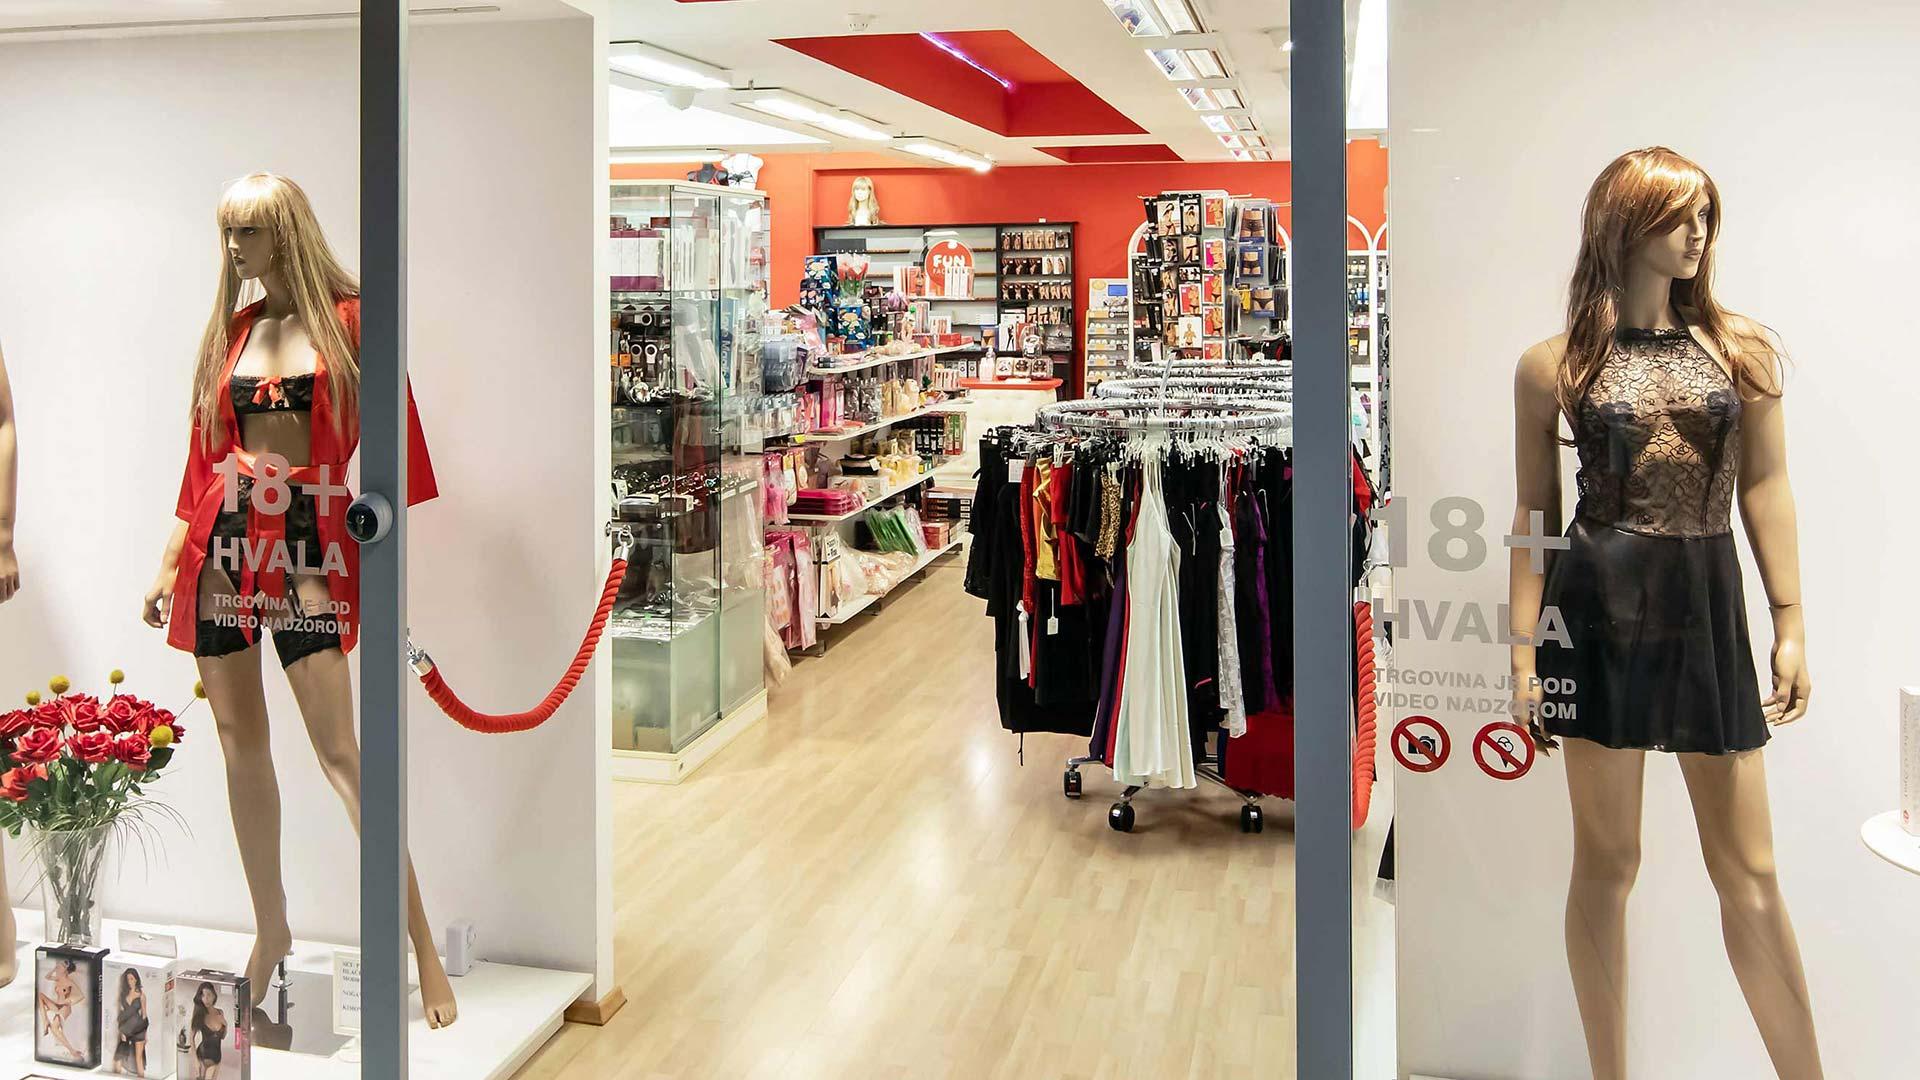 Lolita Erotic Shop